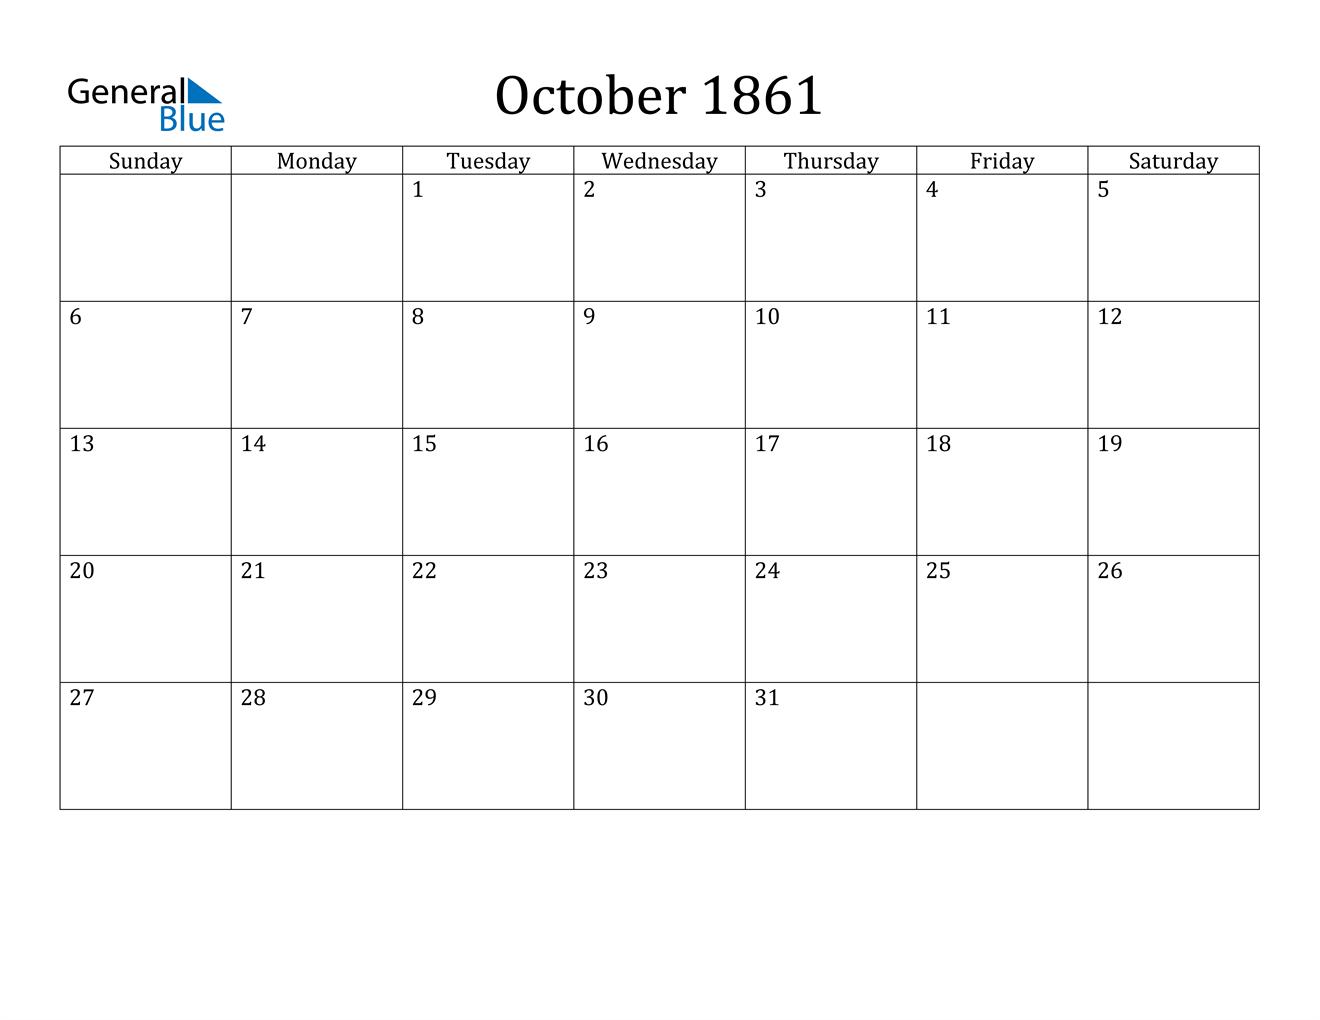 Image of October 1861 Calendar